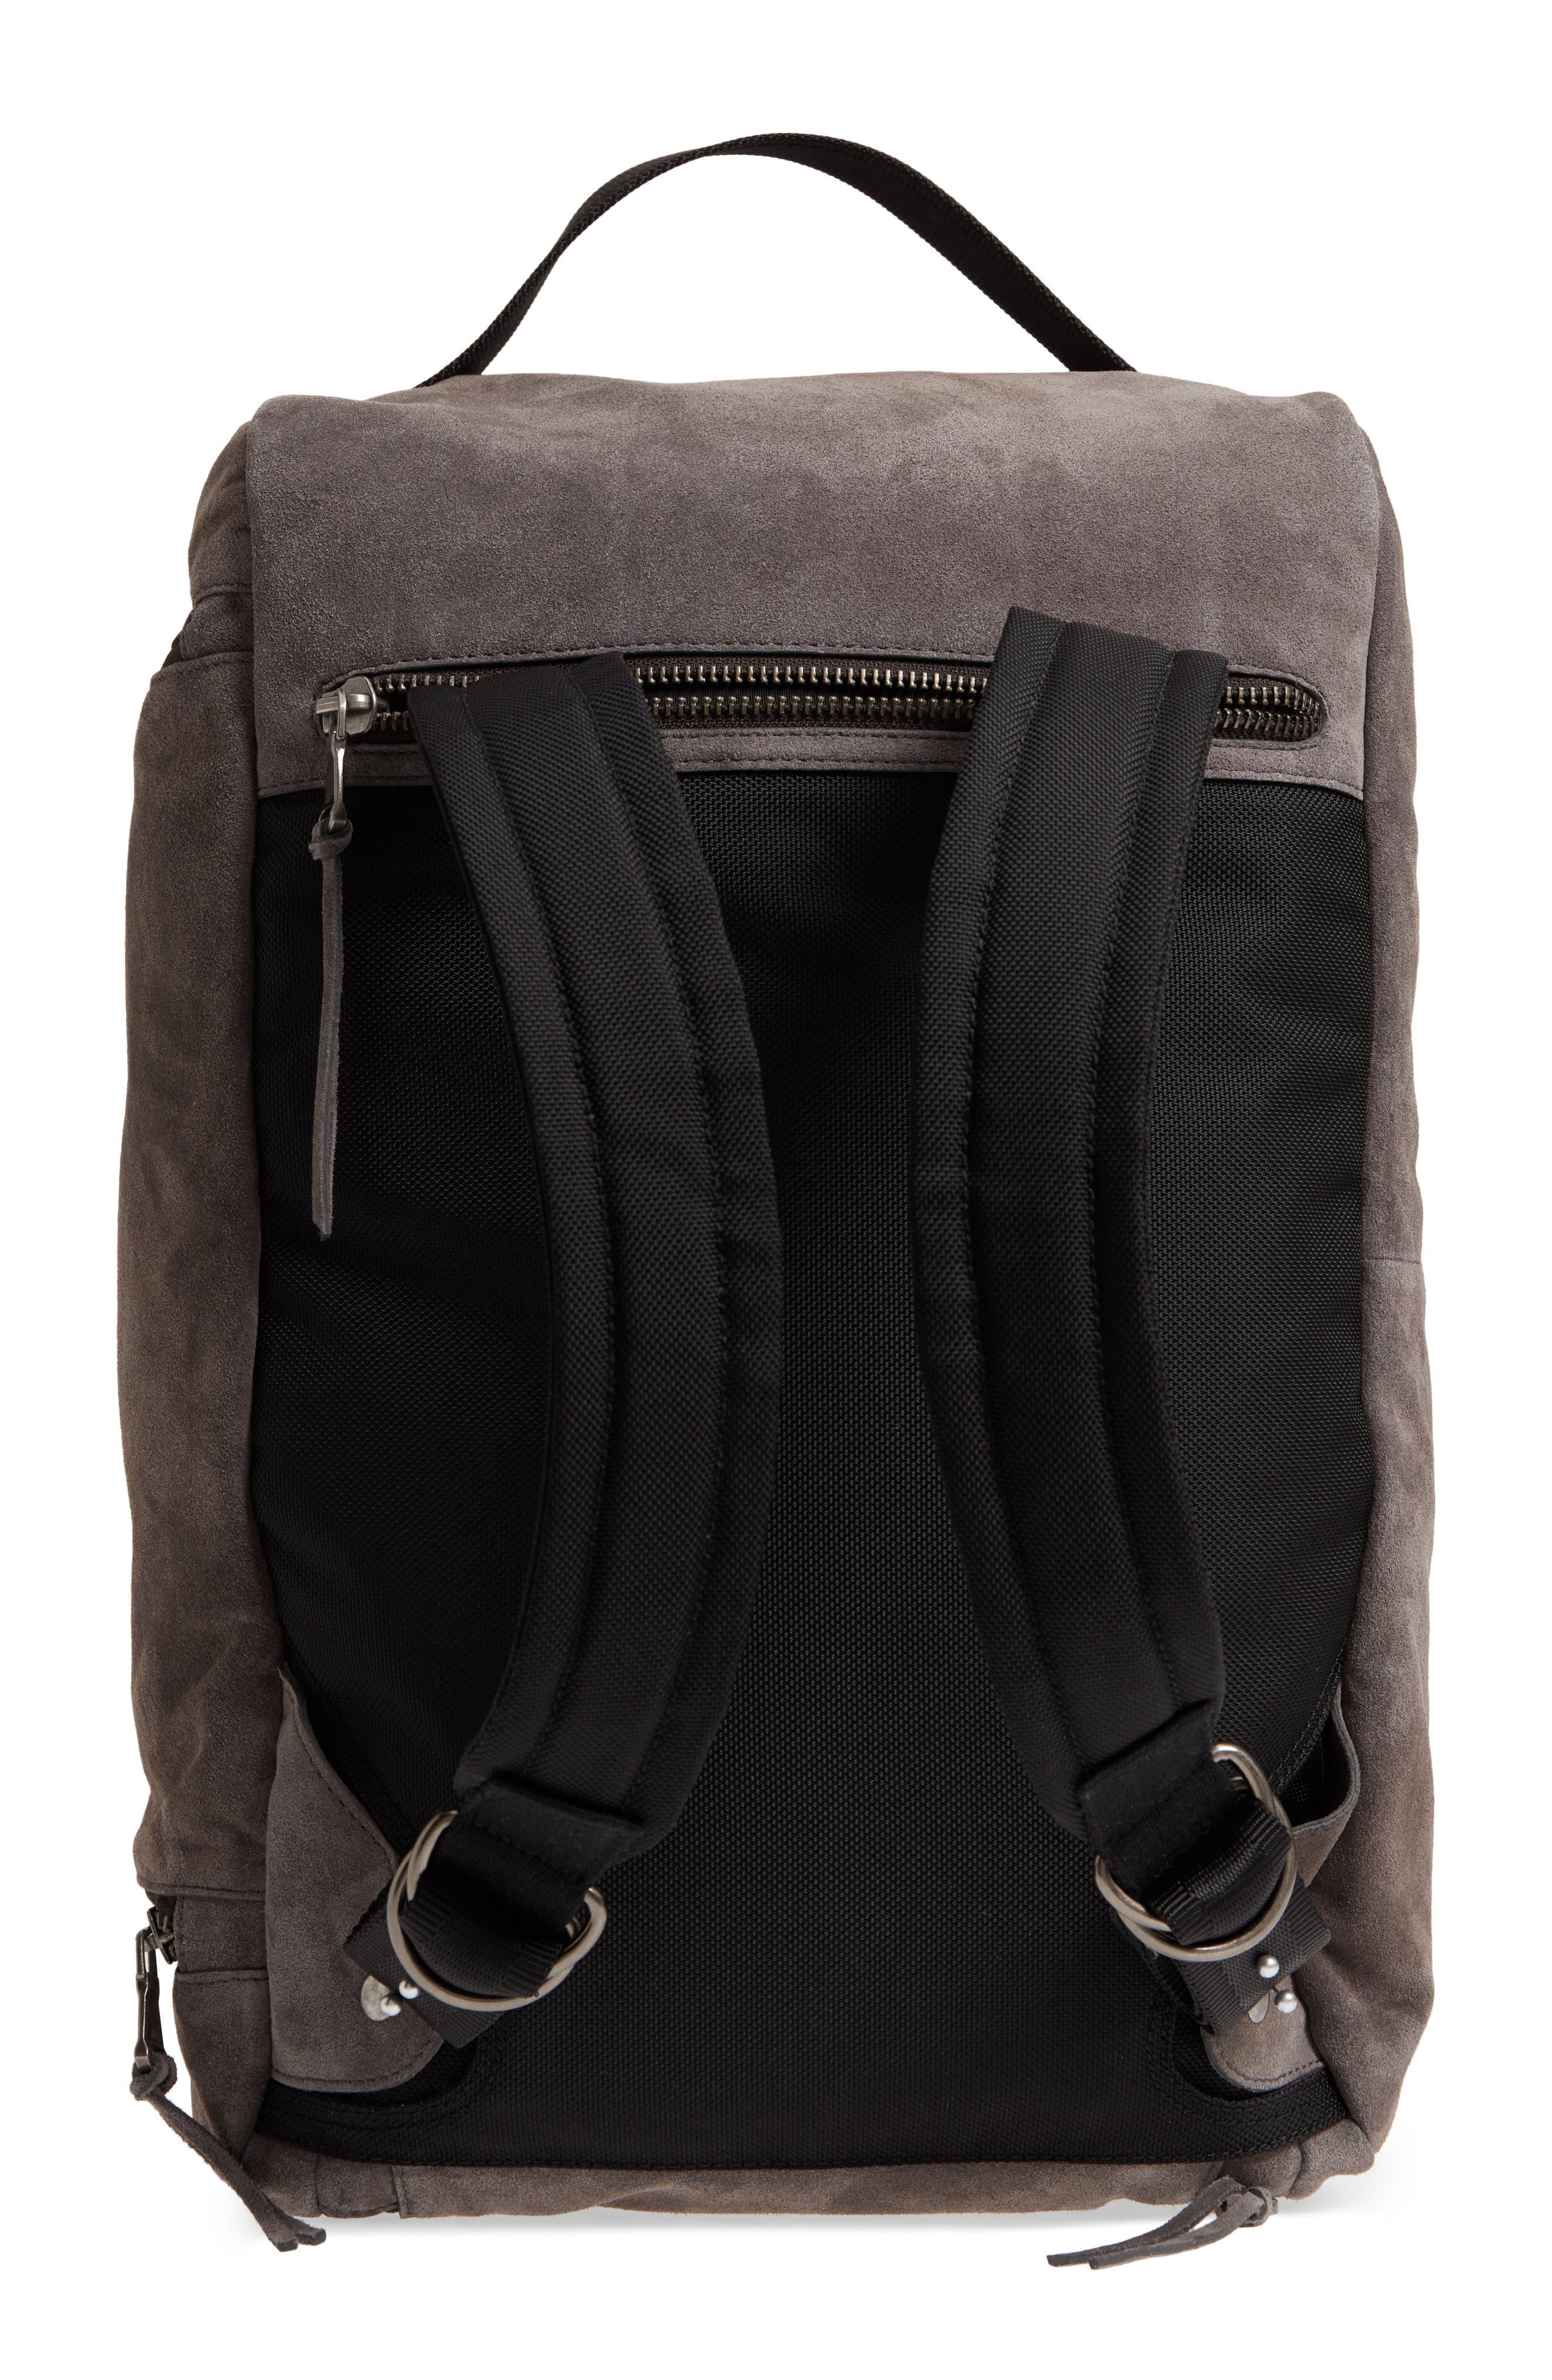 Brooklyn Suede Convertible Duffel Bag,                             Alternate thumbnail 3, color,                             Lead